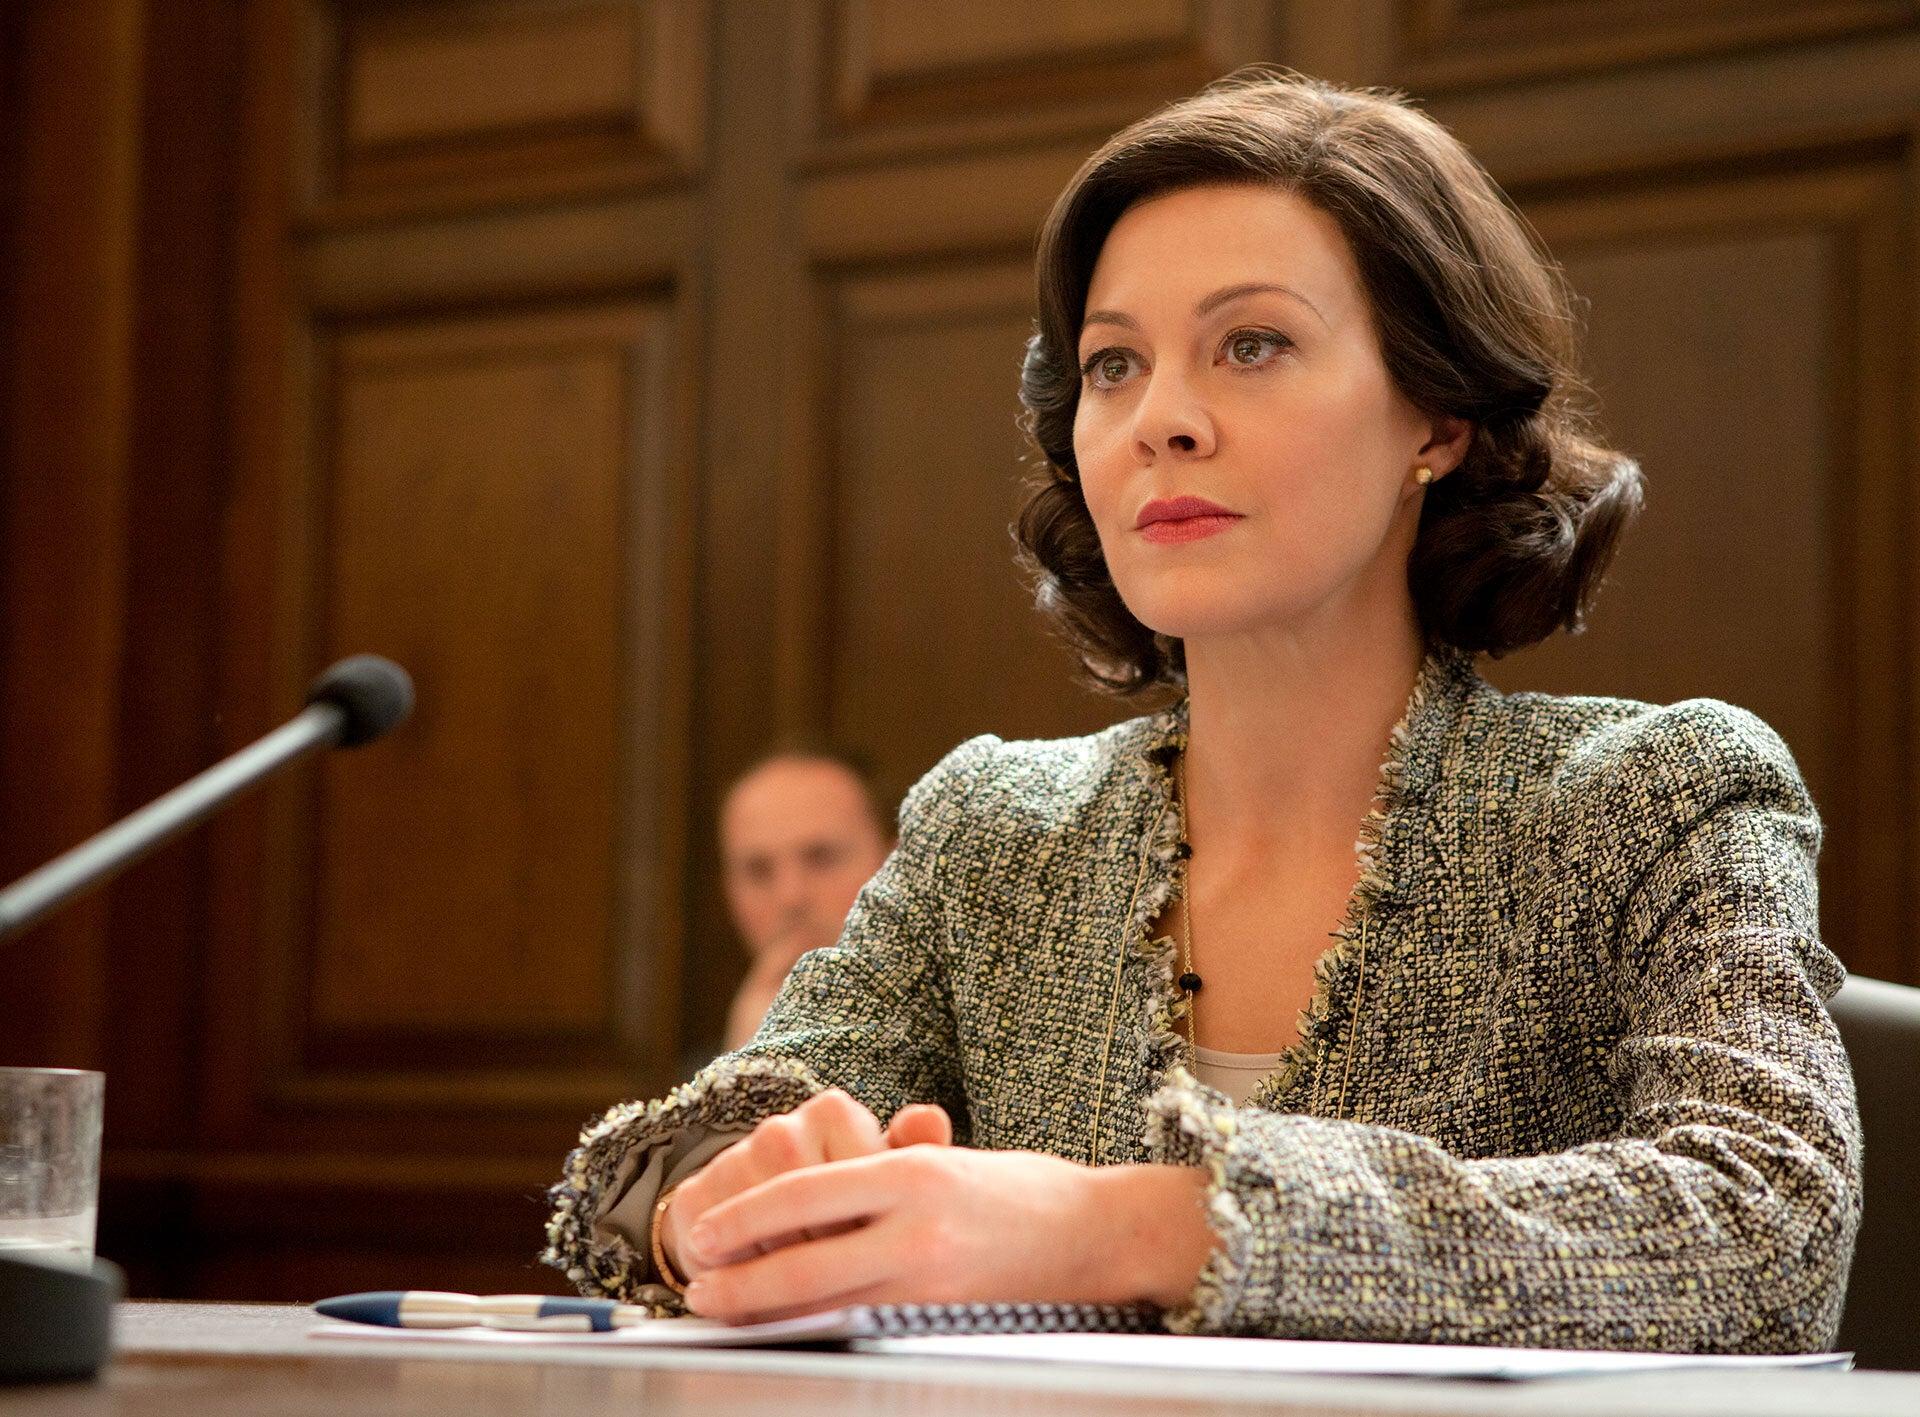 Helen McCrory 1968-2021